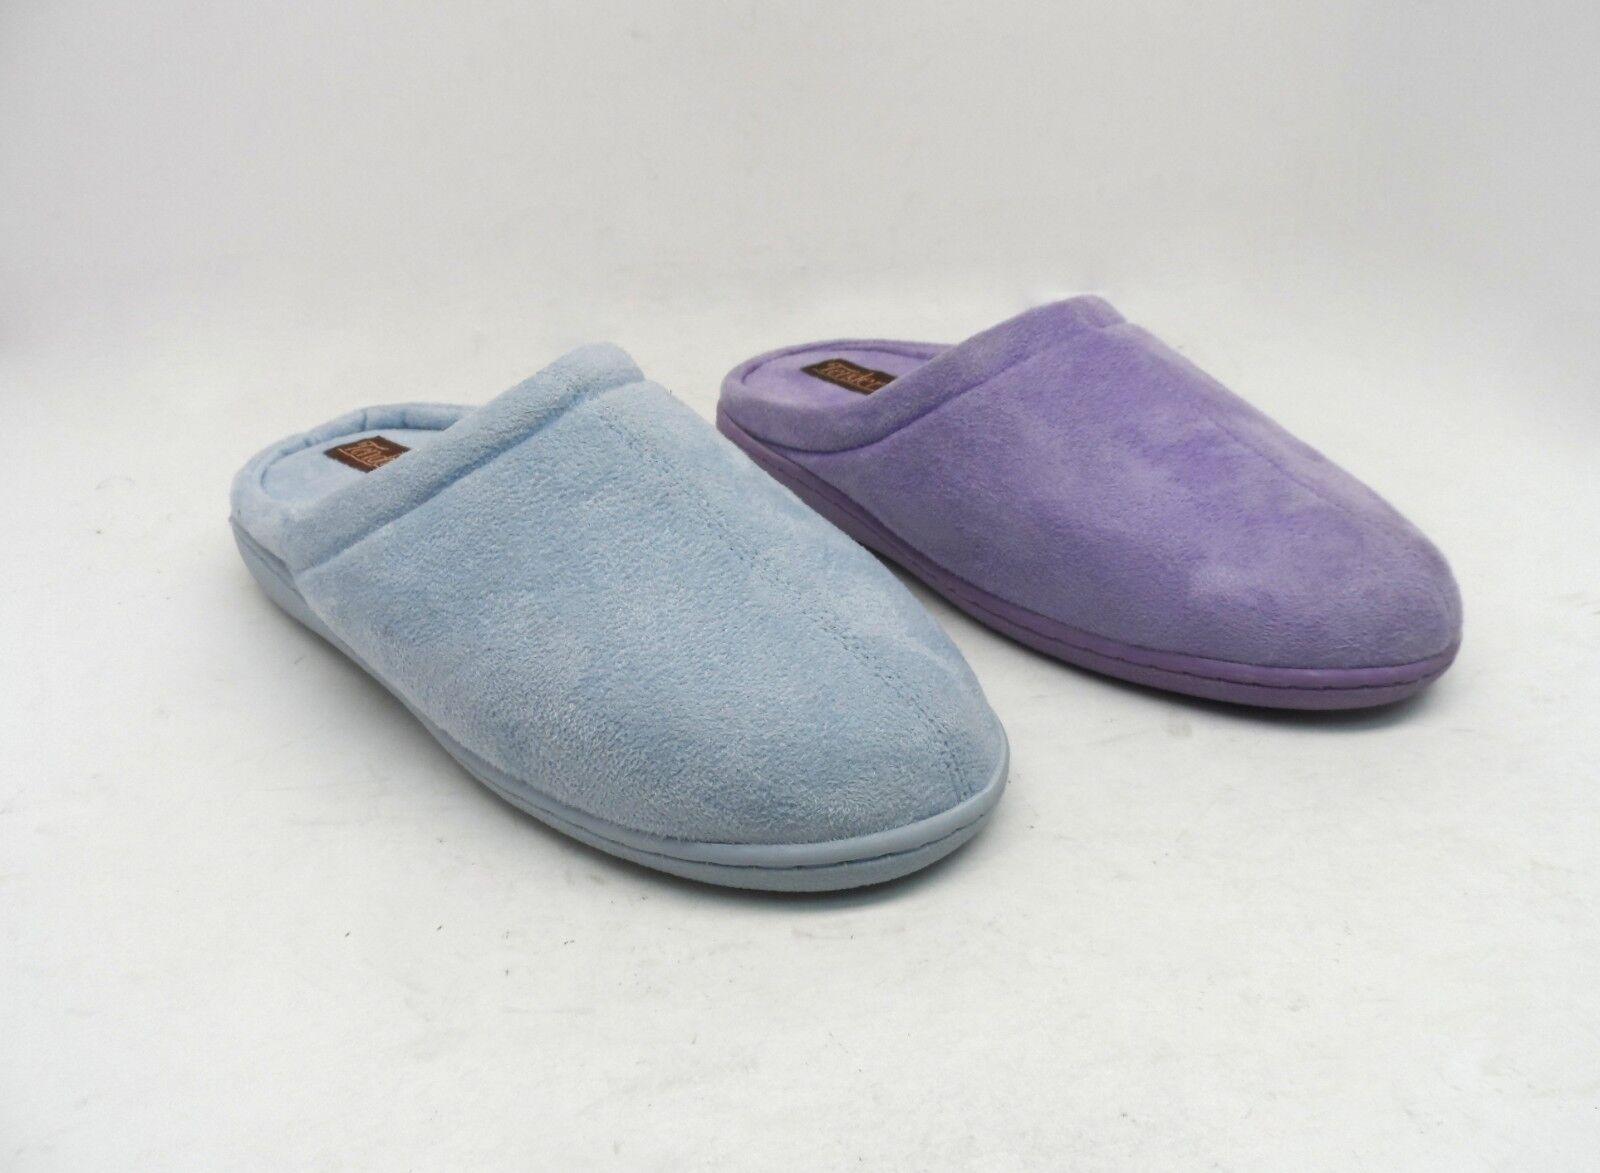 Tender Feet Women's Memory Foam Slippers 100% Polyester Fibe